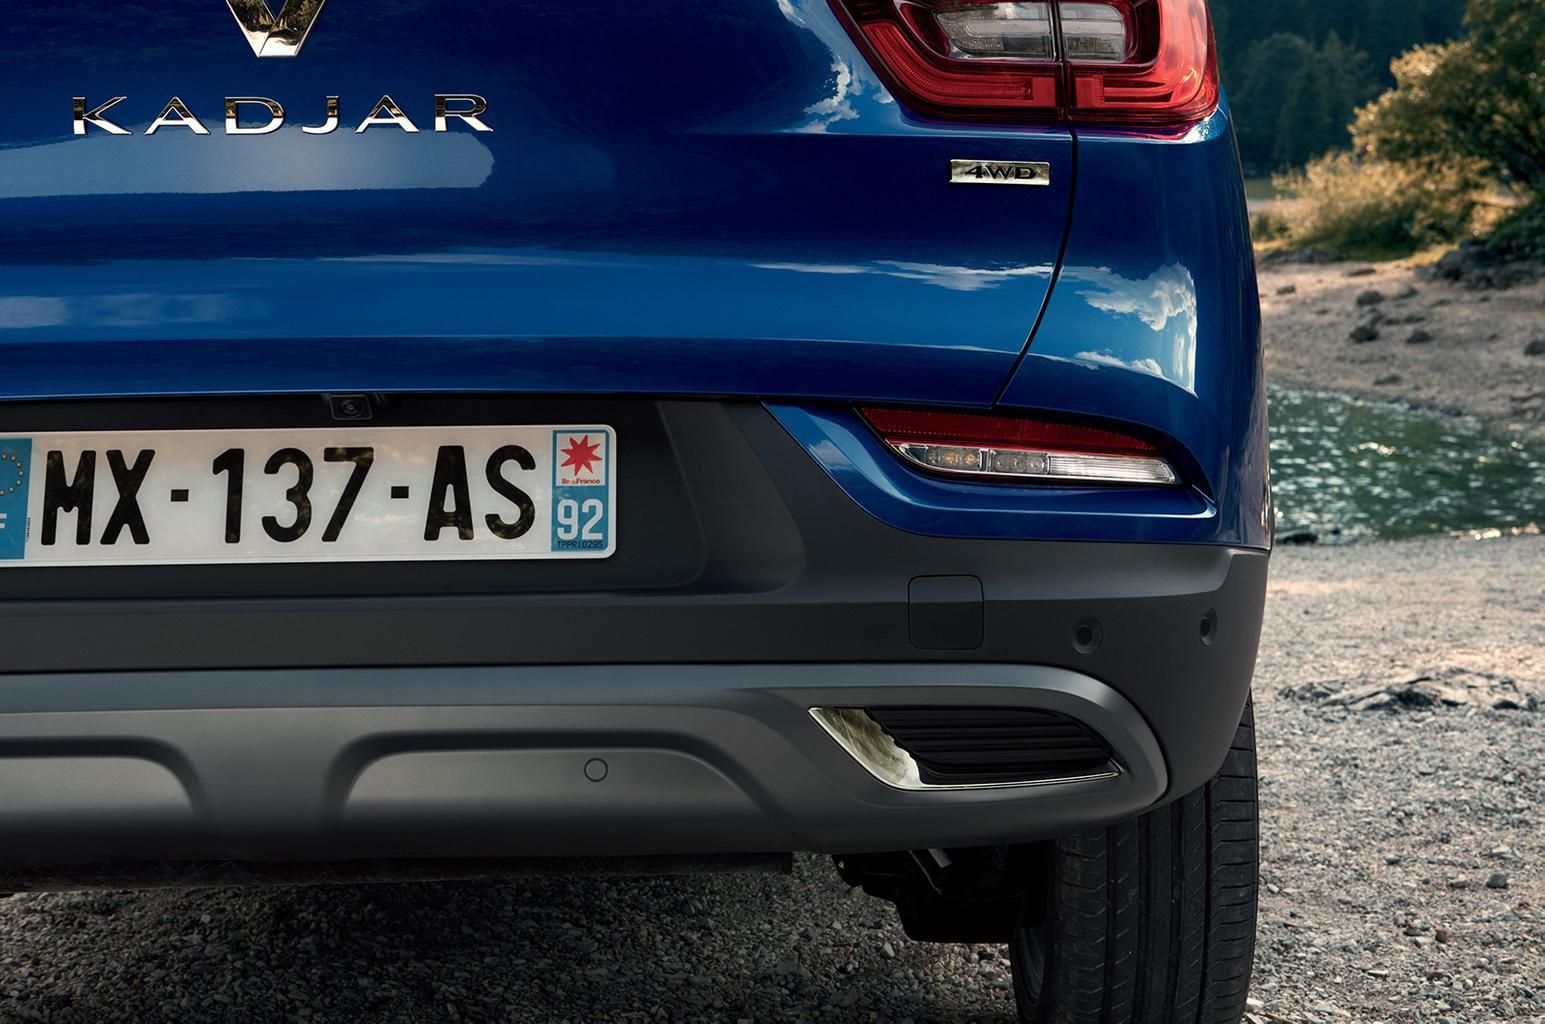 2019 Renault Kadjar – price, specs and release date